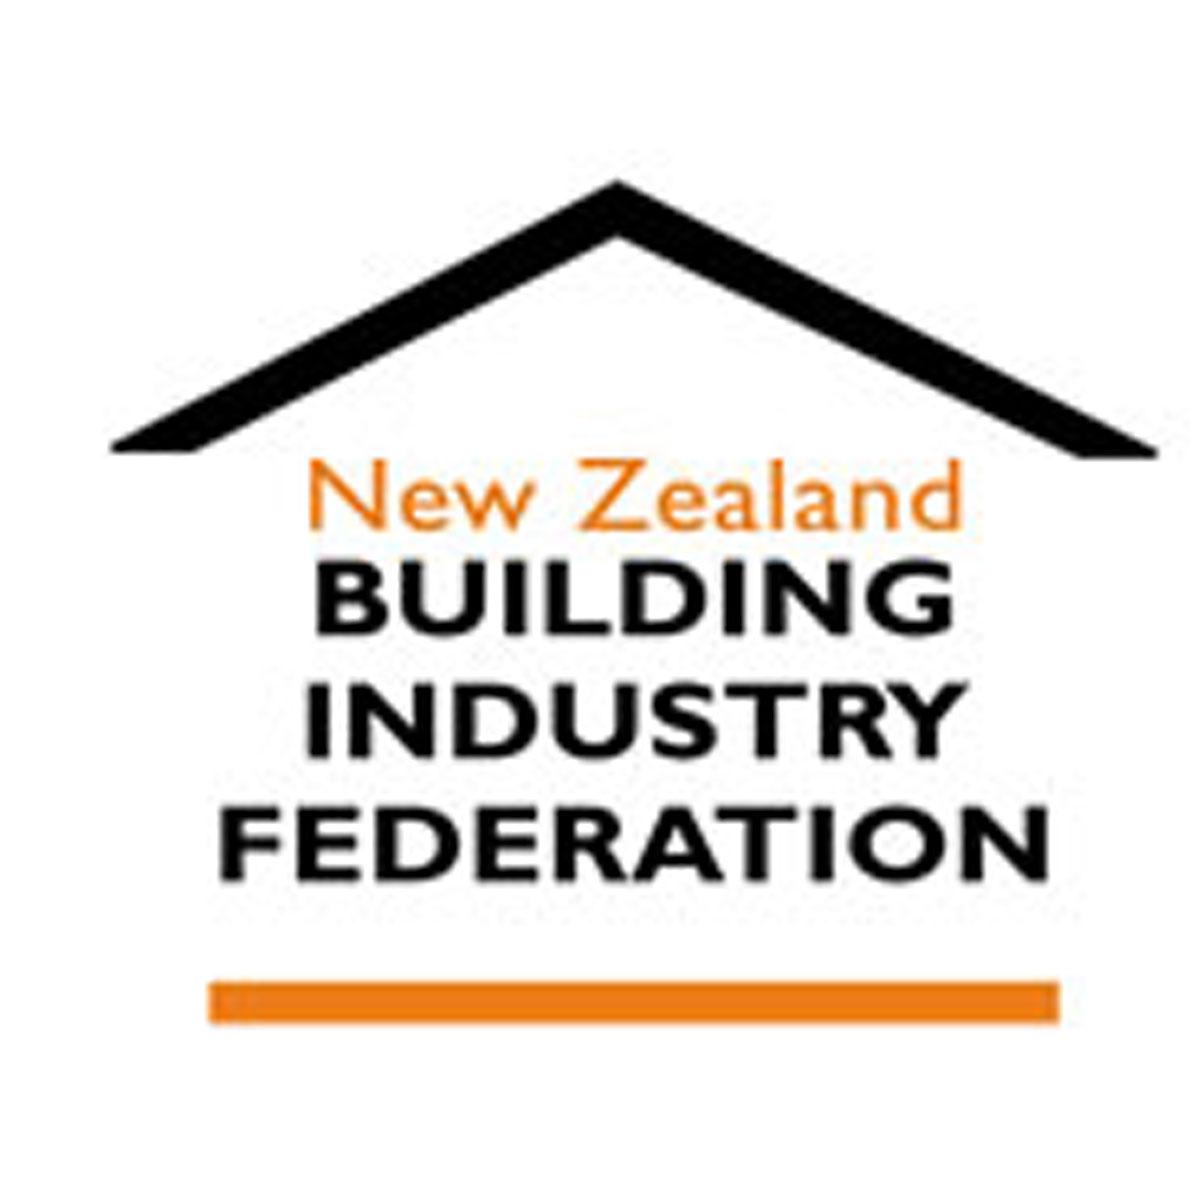 NZ Building